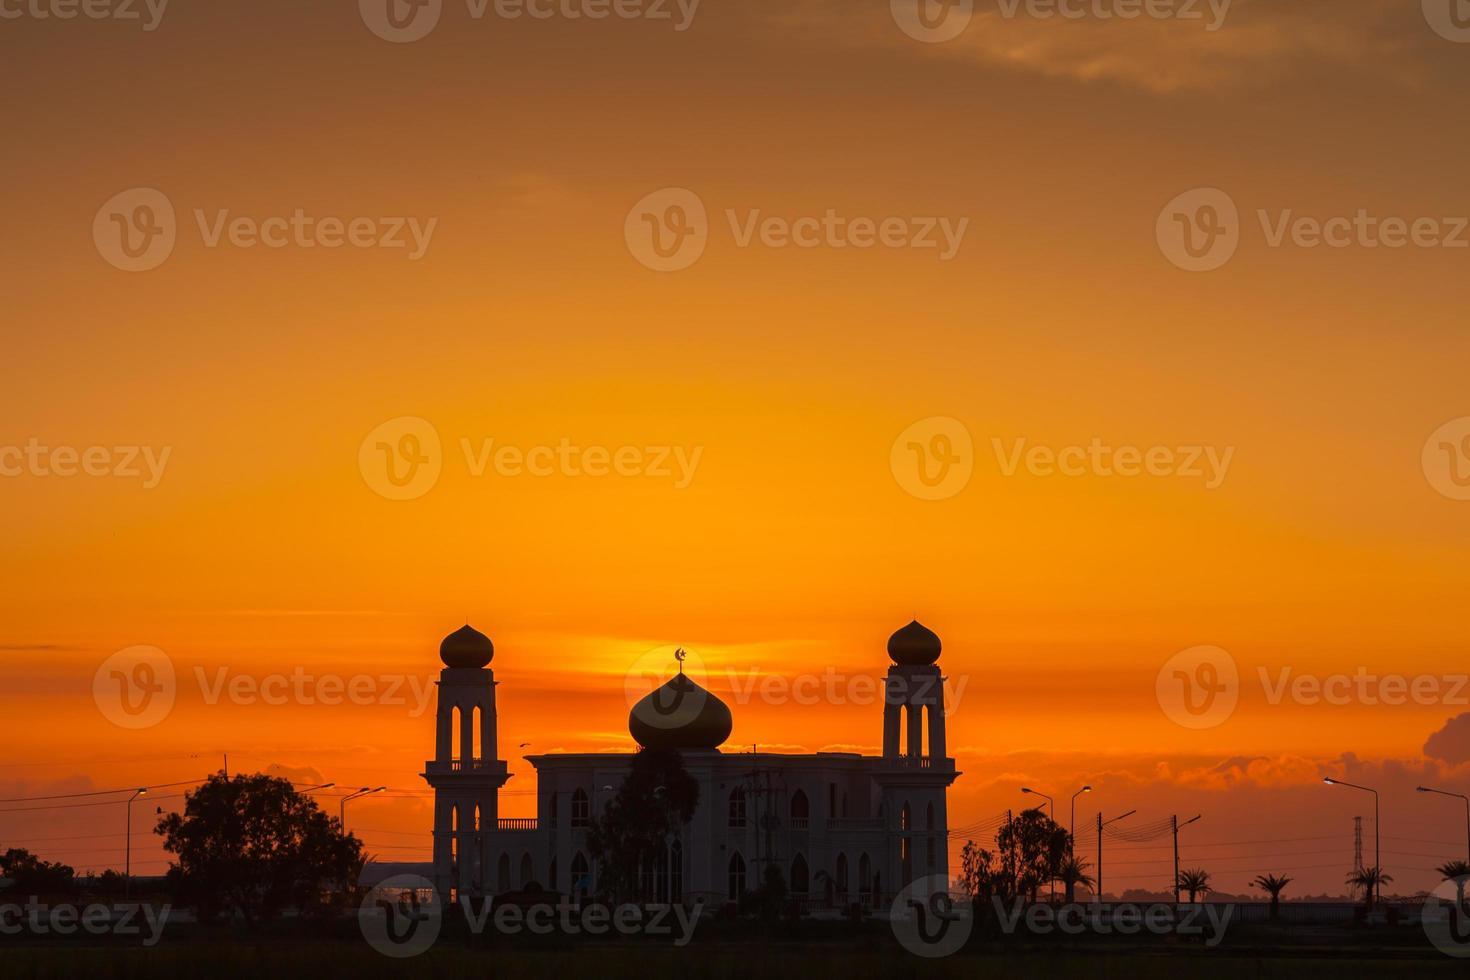 dubai, verenigde arabische emiraten, 2020 - silhouet van de grand bur dubai masjid bij zonsondergang foto